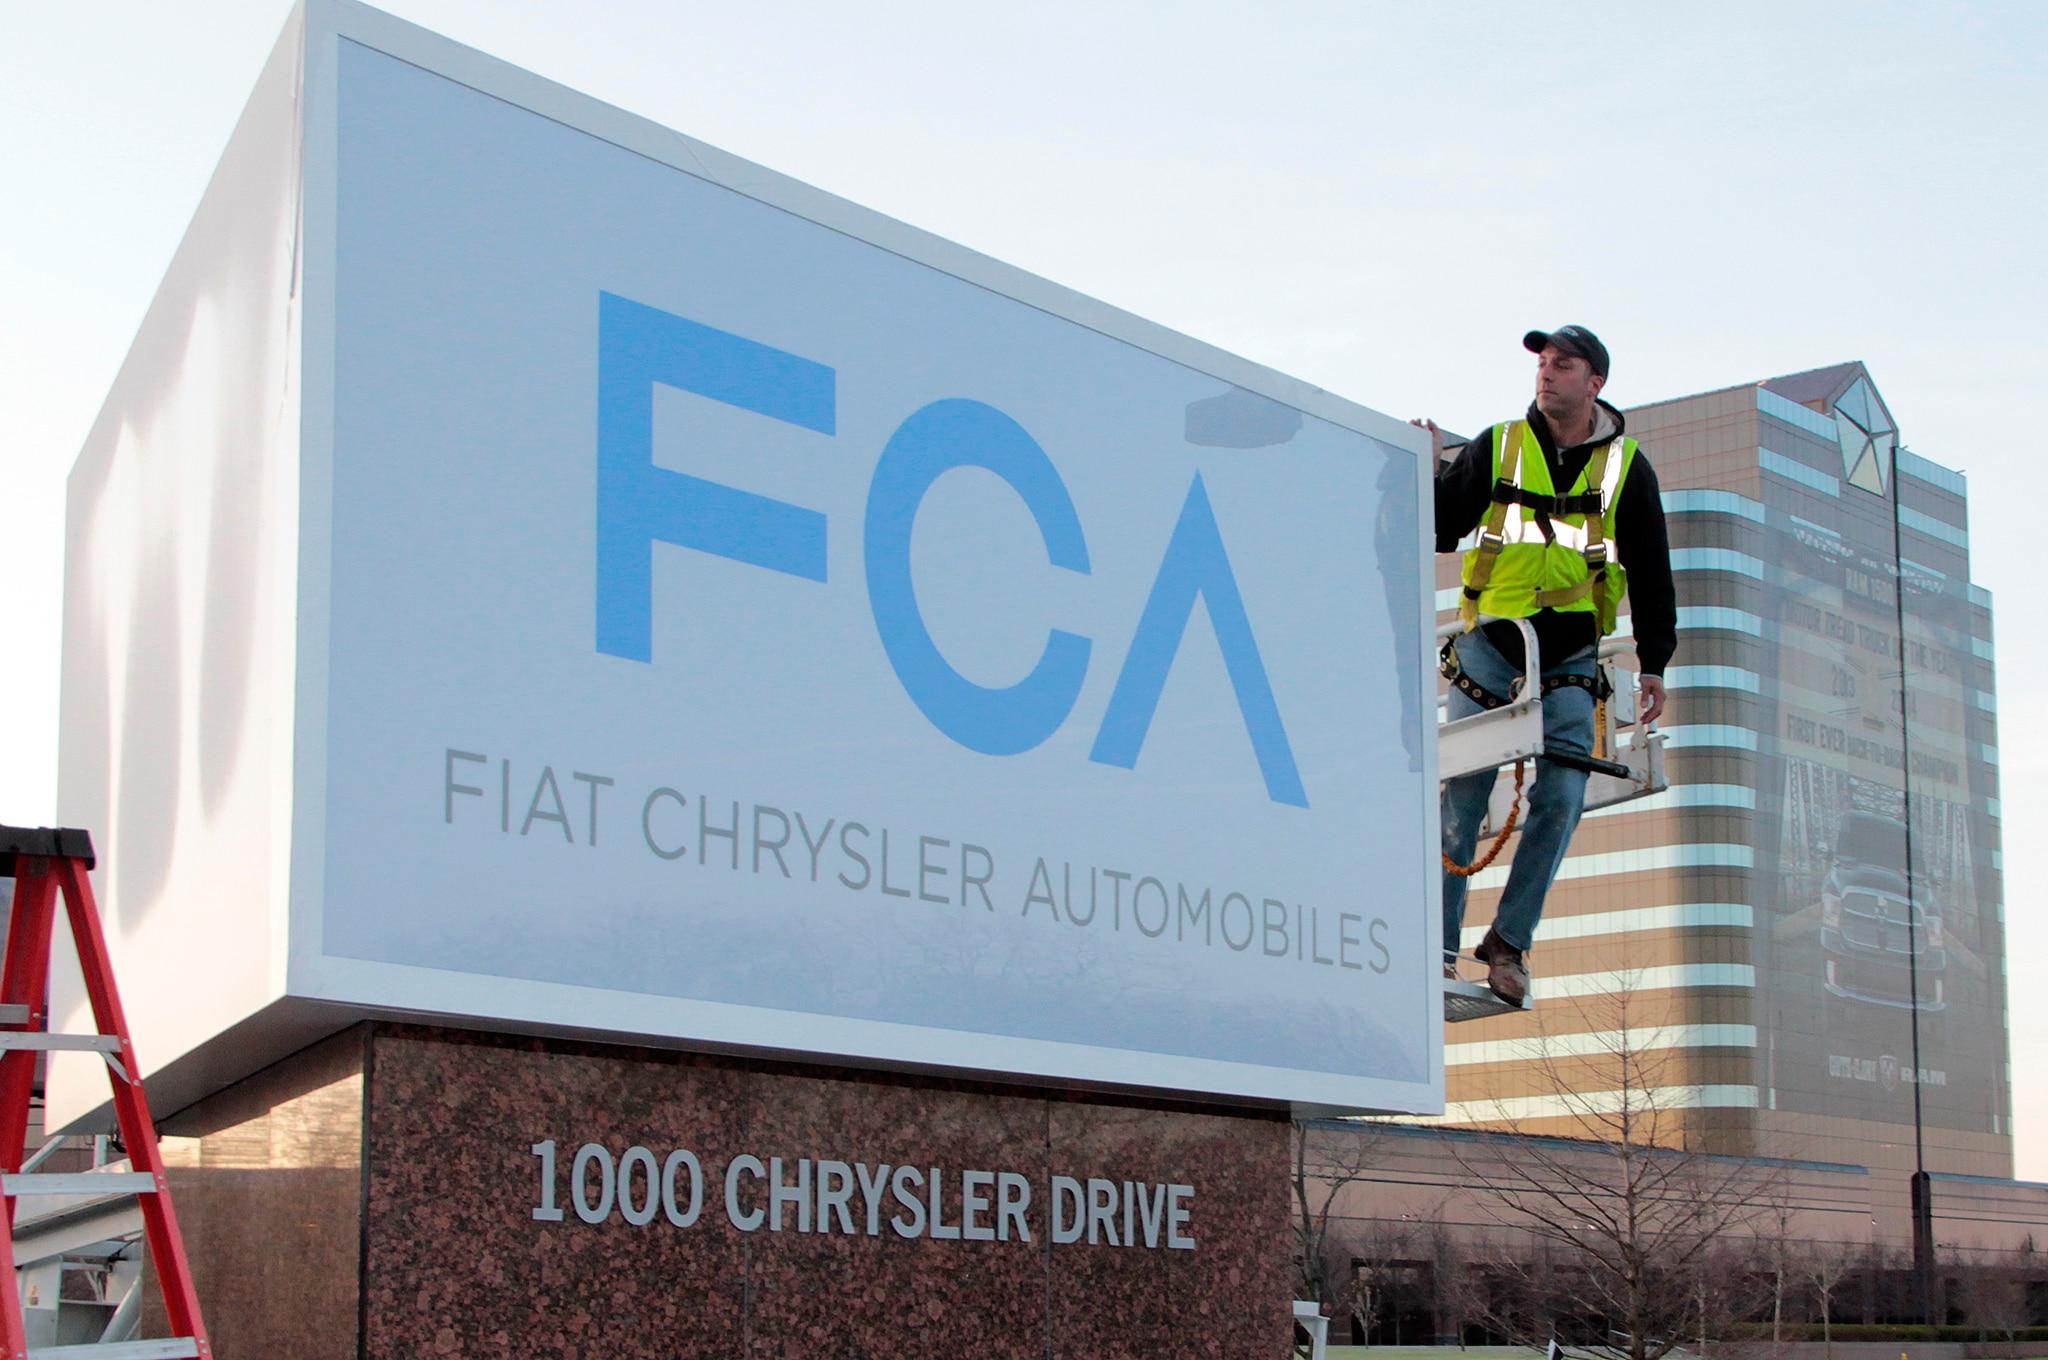 http://st.automobilemag.com/uploads/sites/11/2014/05/fiat-chrysler-automobiles-new-sign-construction-41.jpg